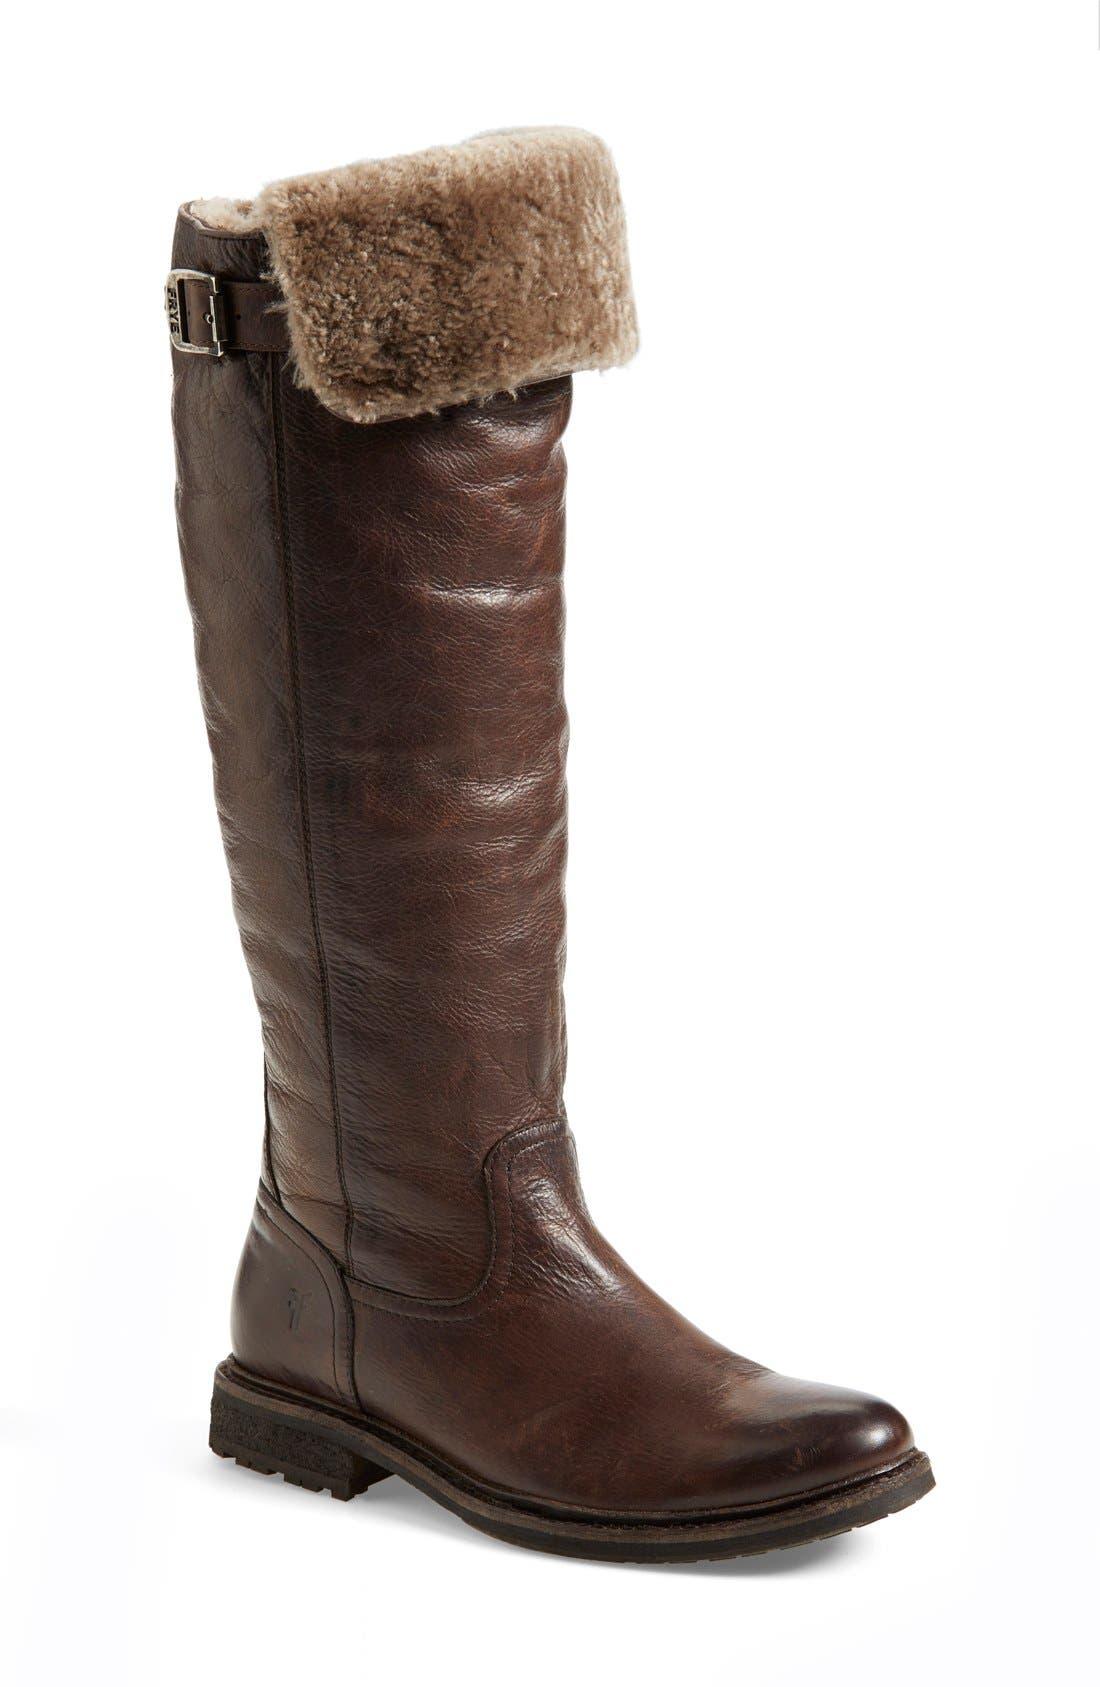 Alternate Image 1 Selected - Frye 'Mara Button' Boot (Women)